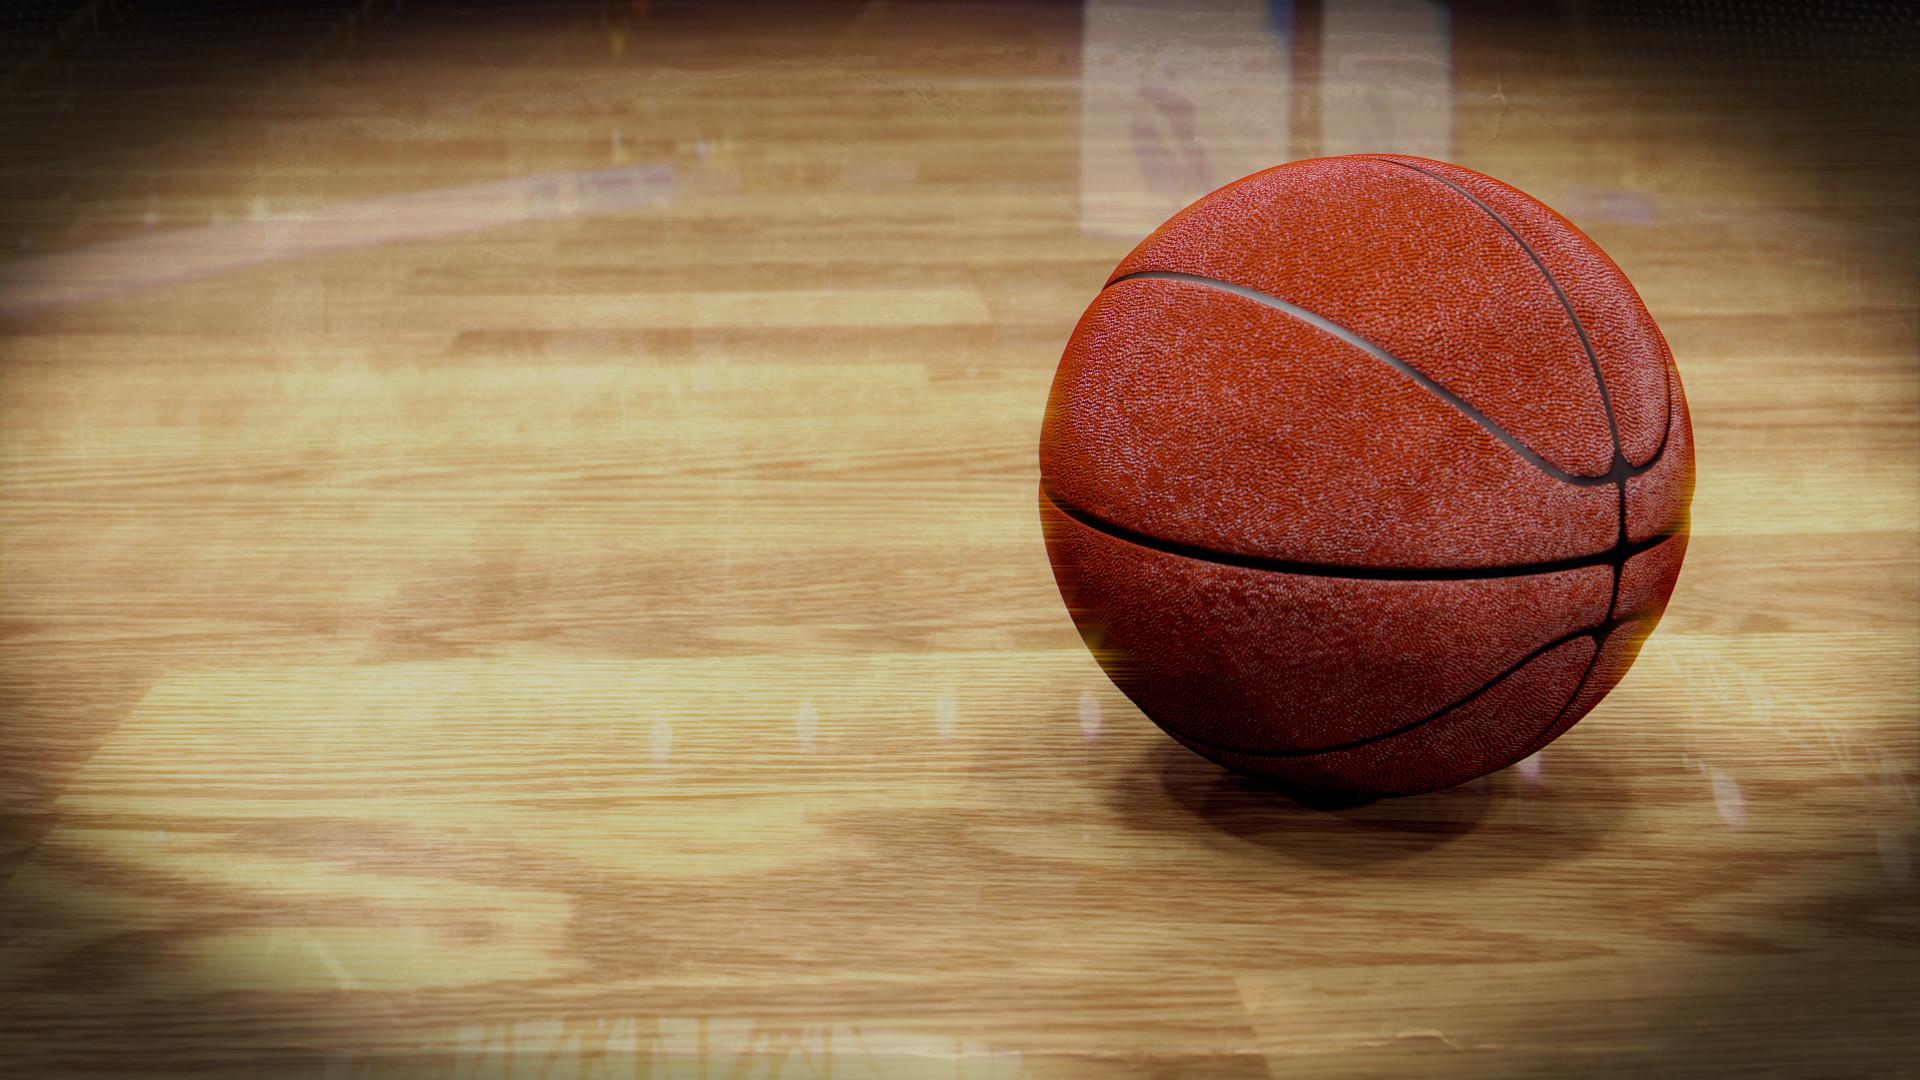 Free Basketball Wallpaper